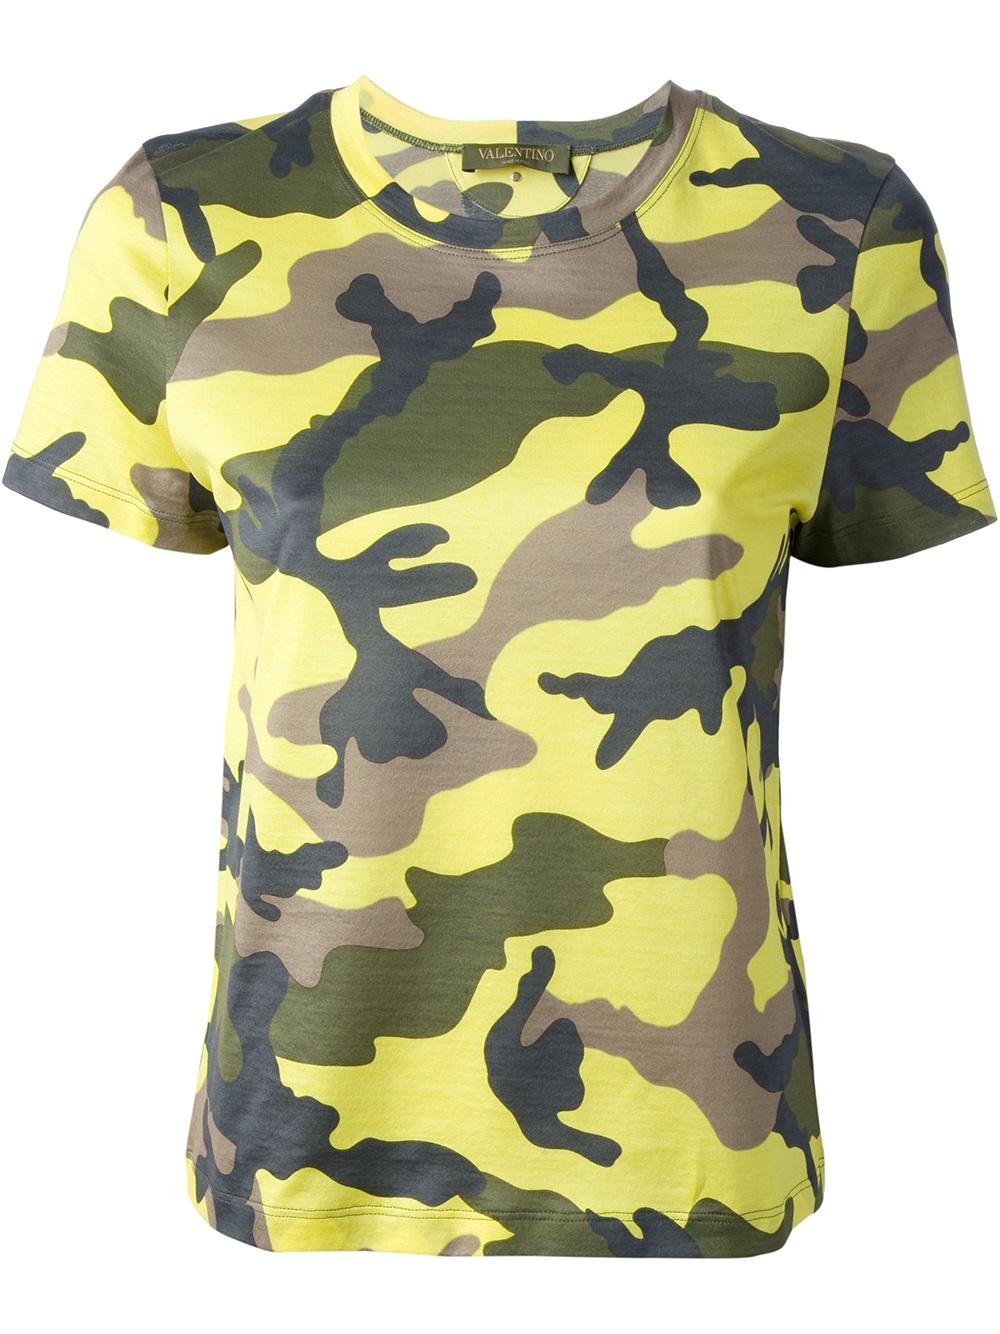 camouflage T-shirt - Yellow & Orange Valentino Buy Cheap Prices Popular w1fLa7Sd